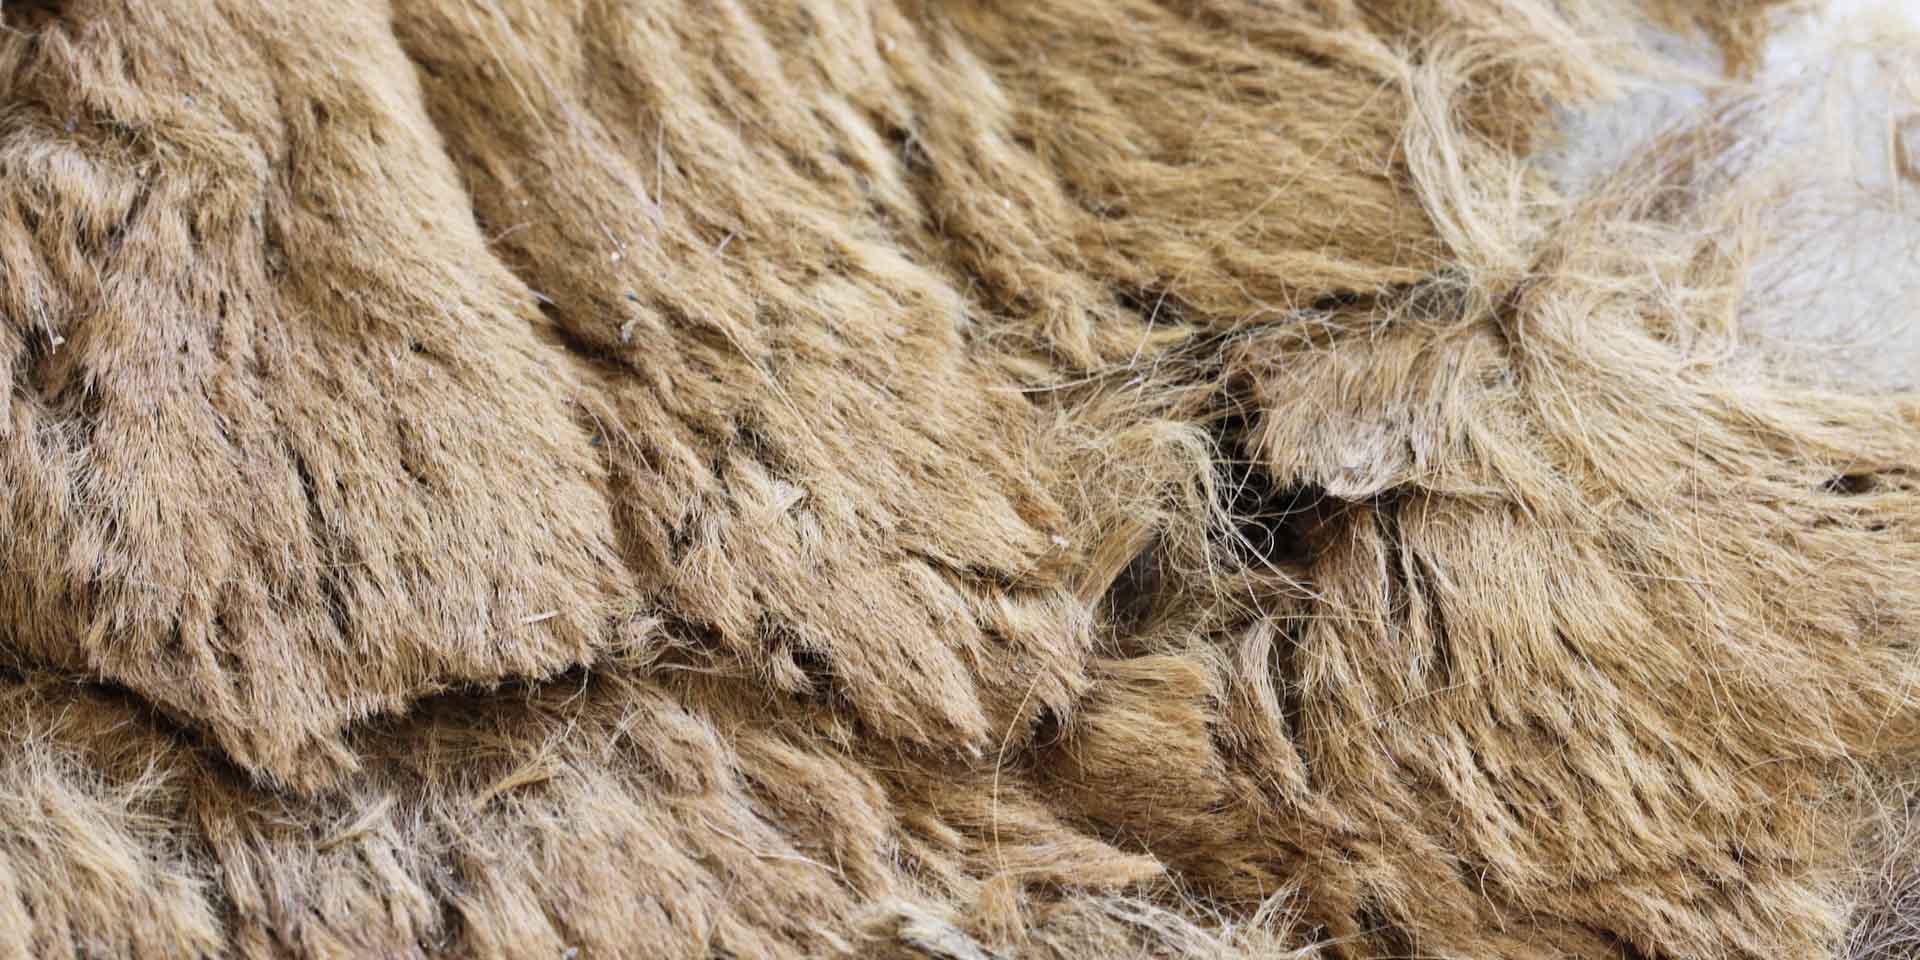 Close-up of preserved brown bear pelt